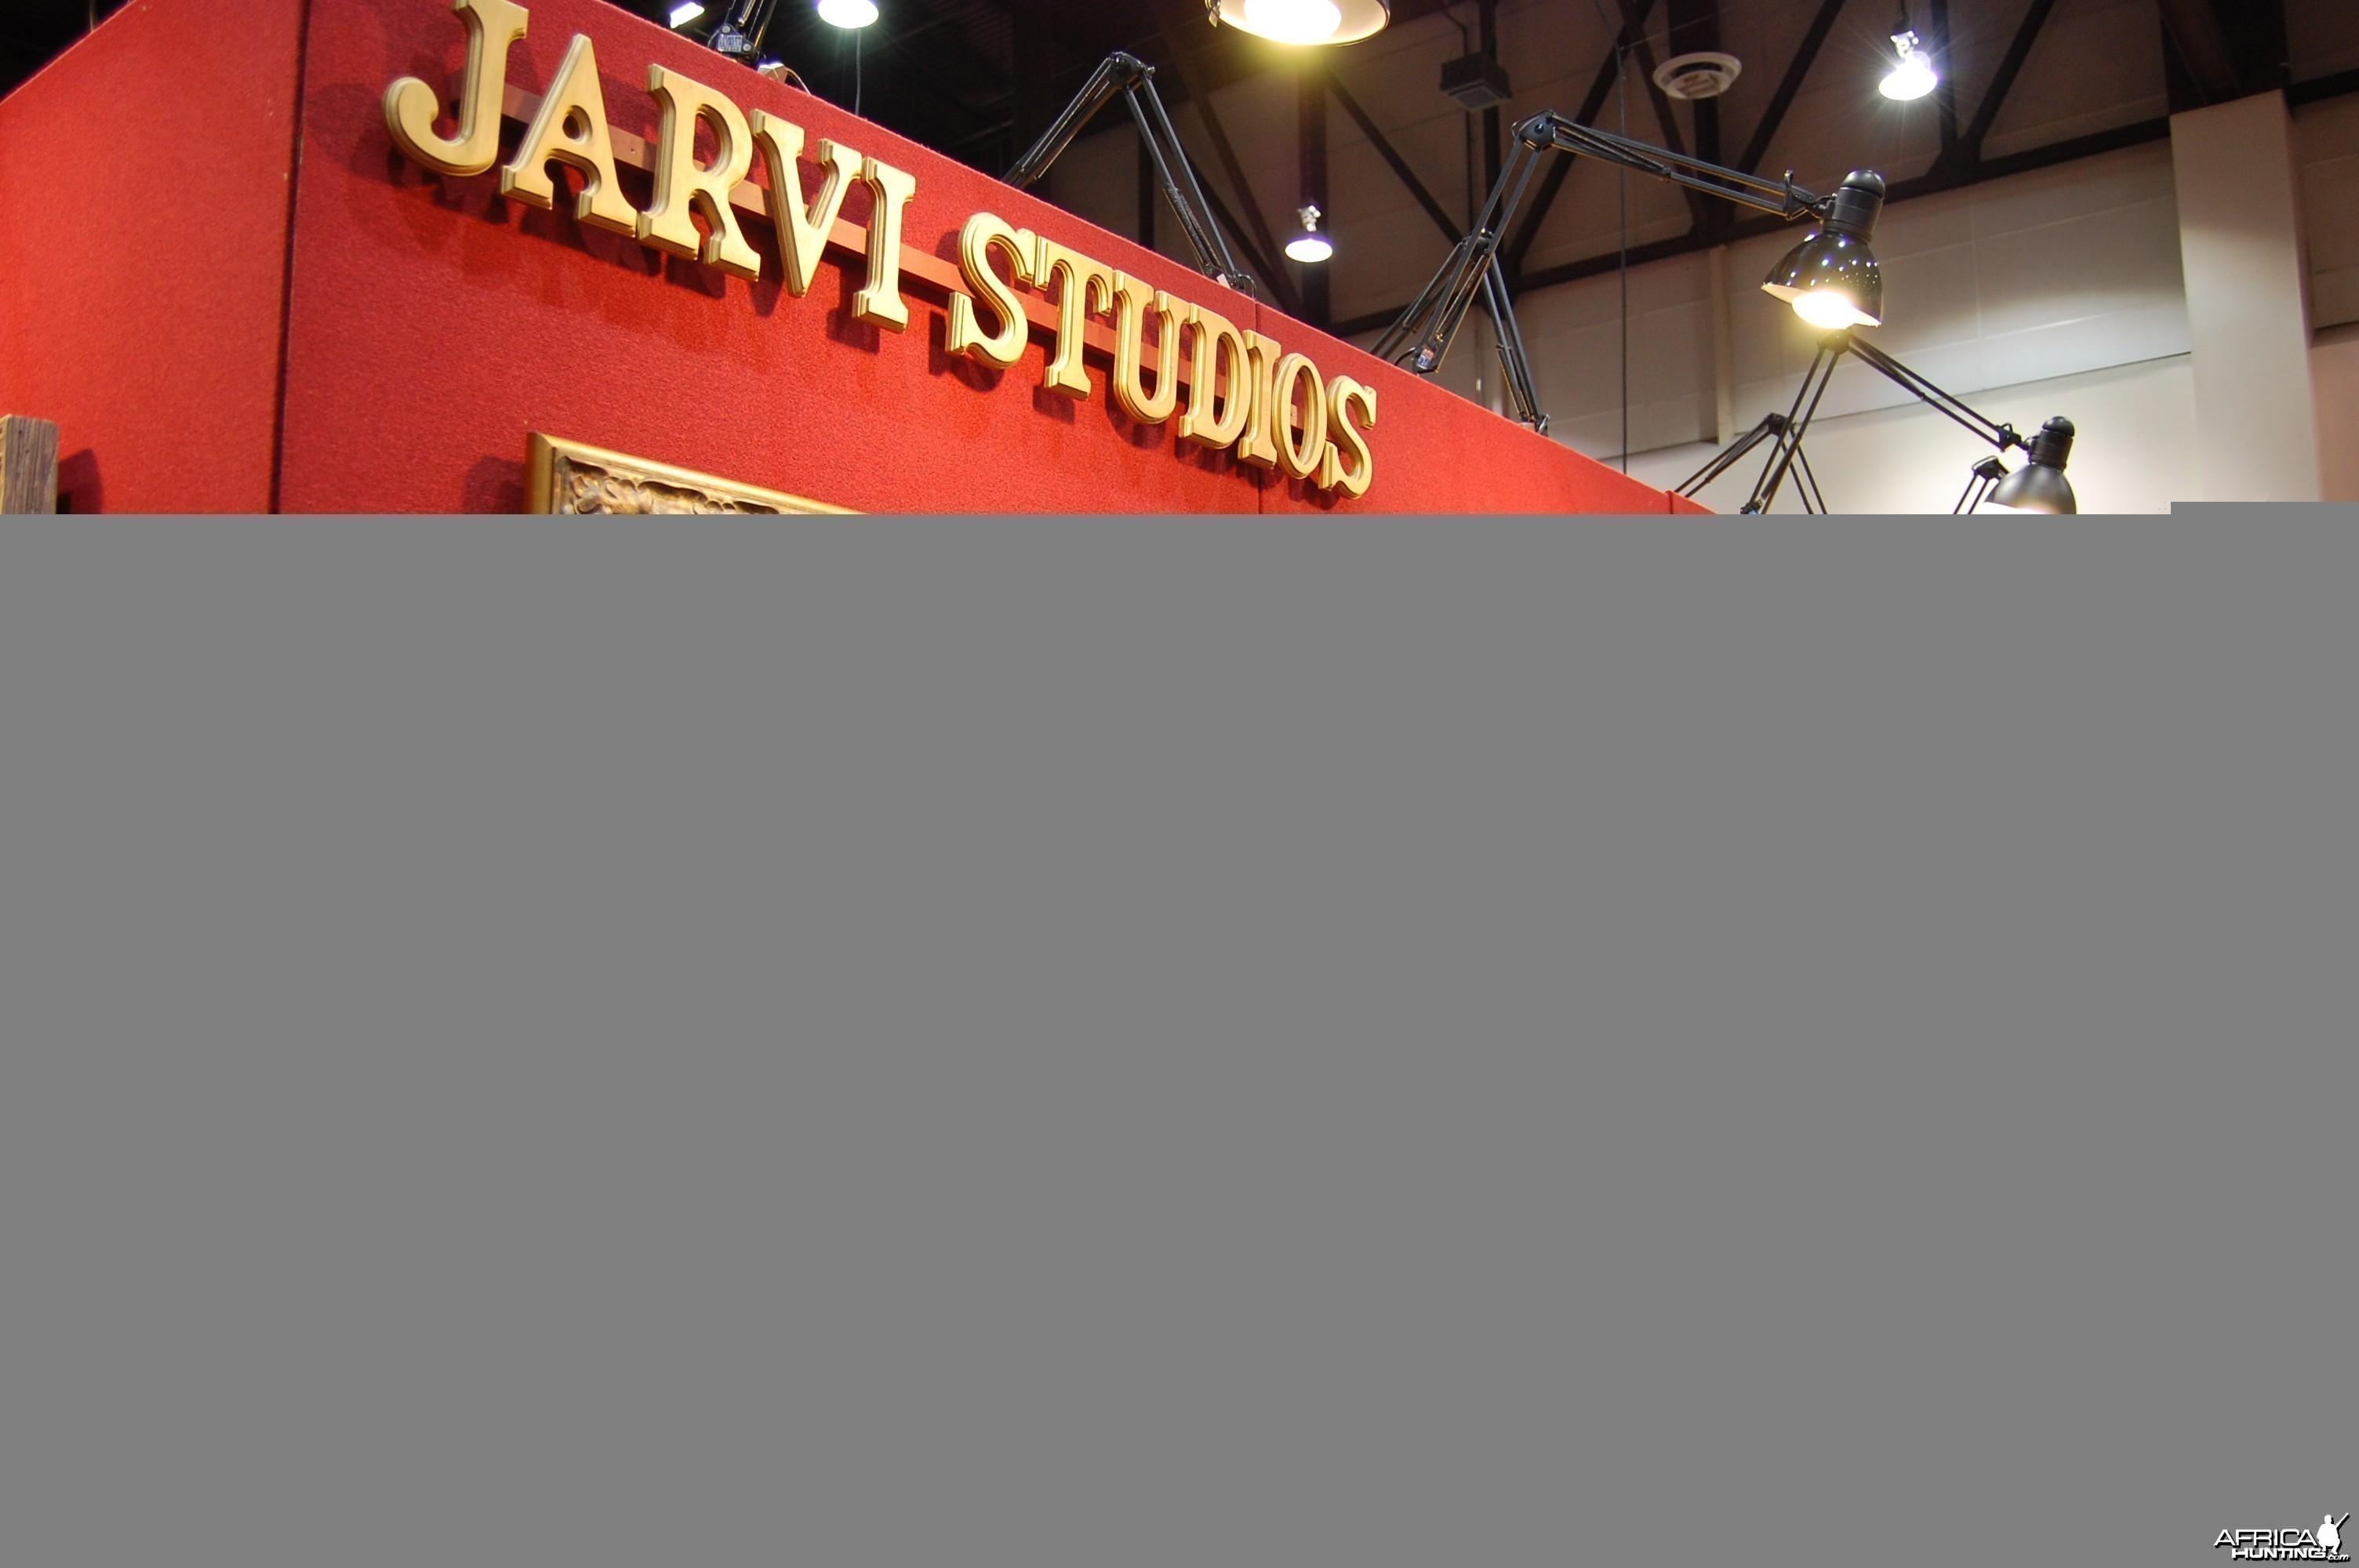 Jarvi Studios